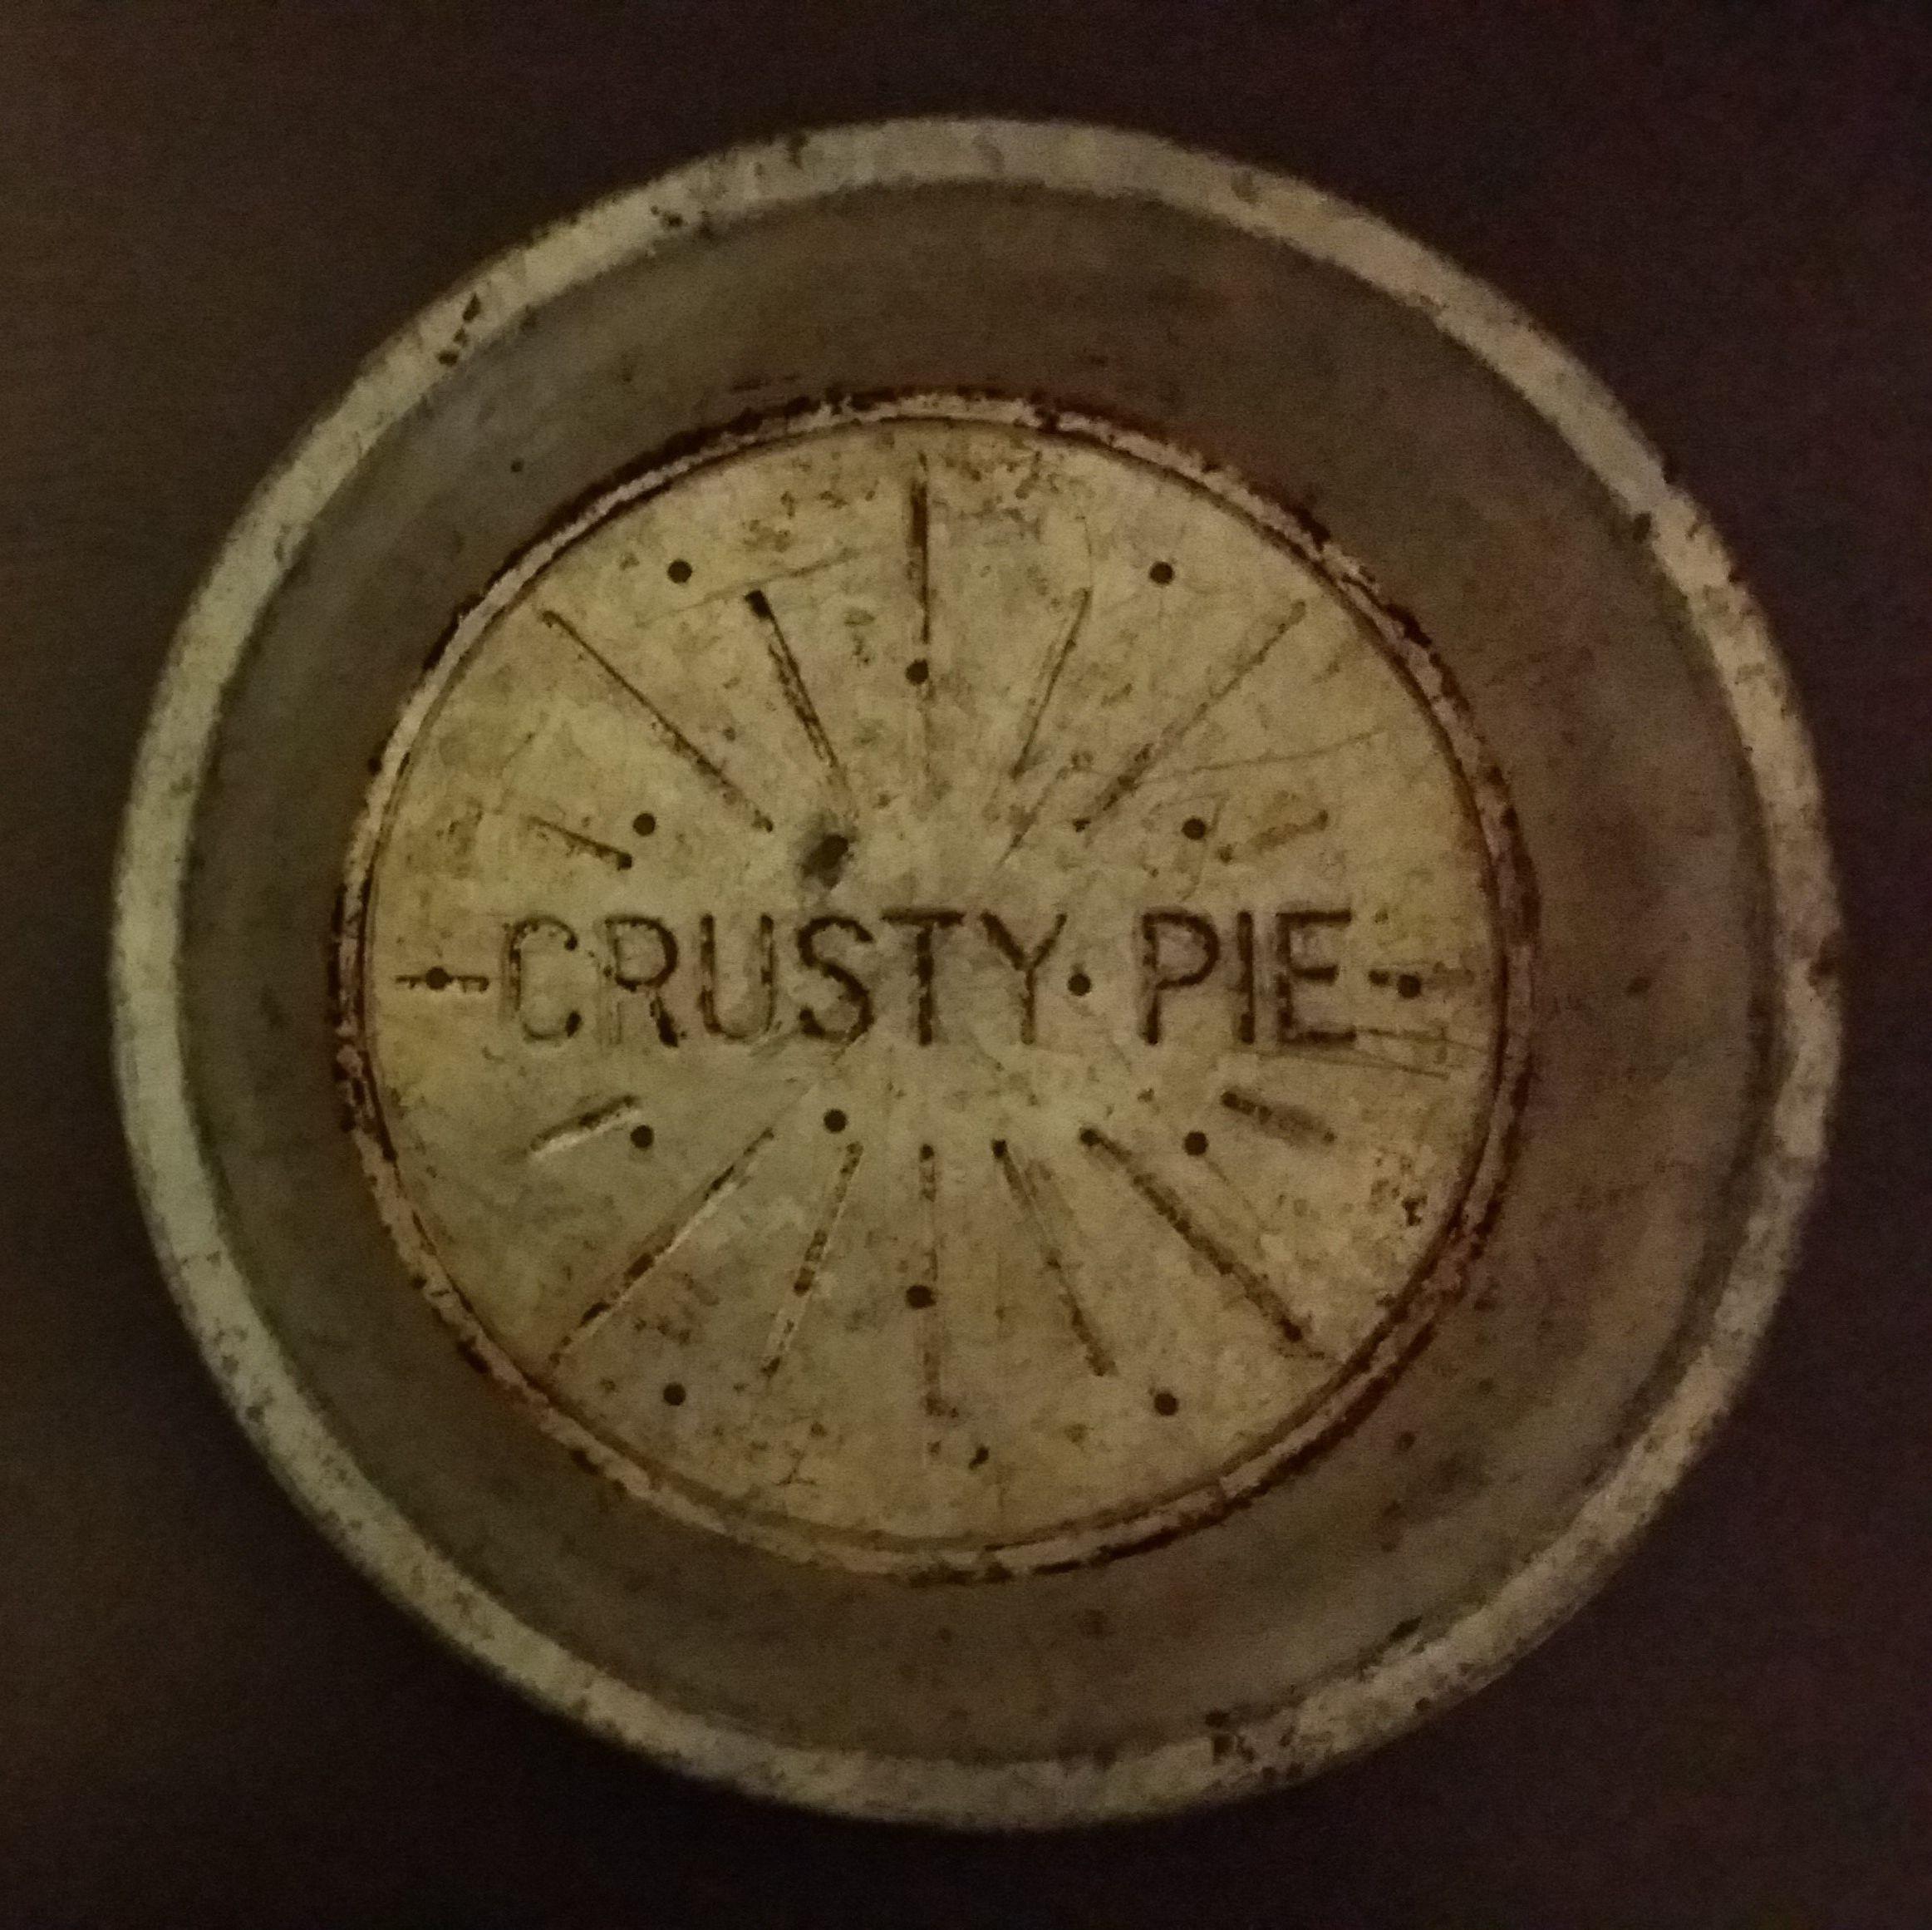 Crusty Pie